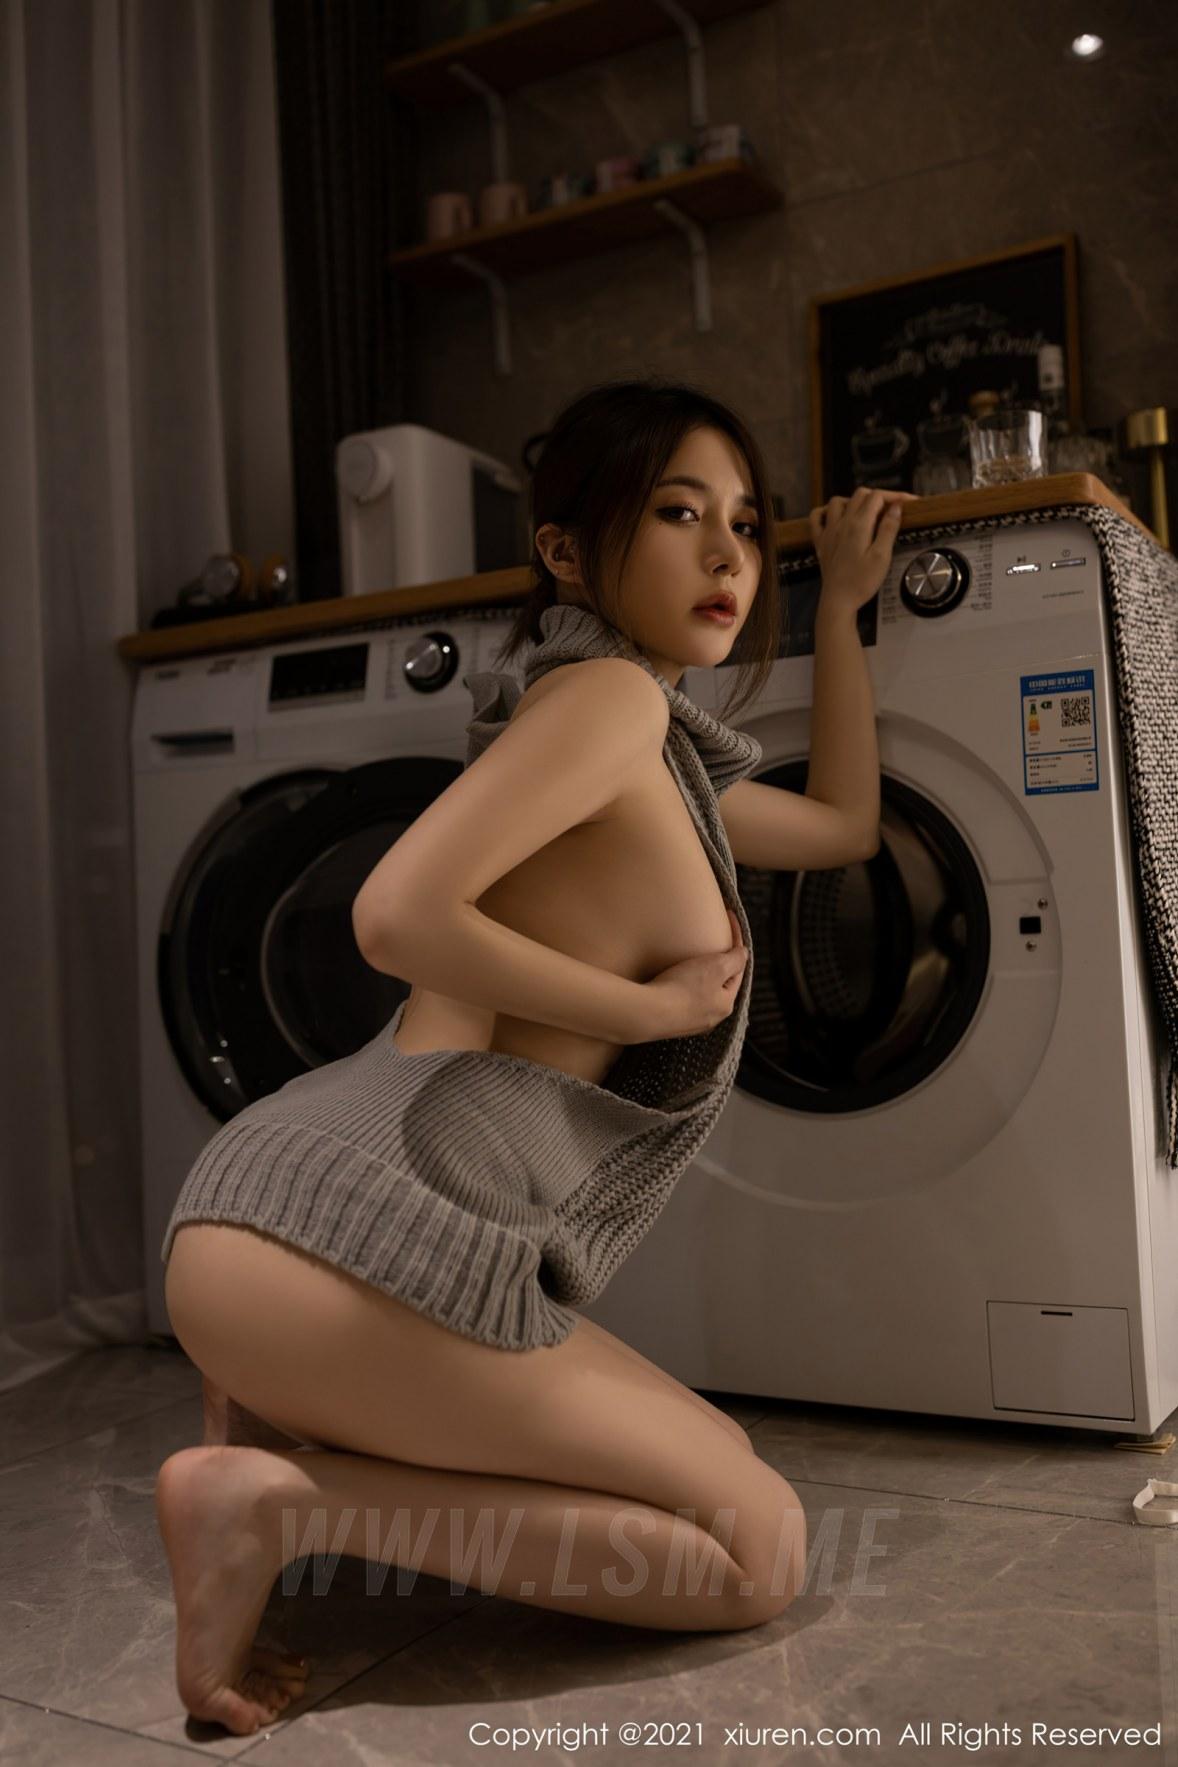 3620 079 40c 3600 5400 - XiuRen 秀人 No.3620 洗衣机维修主题 鱼子酱Fish 性感写真111 - 秀人网 -【免费在线写真】【丽人丝语】